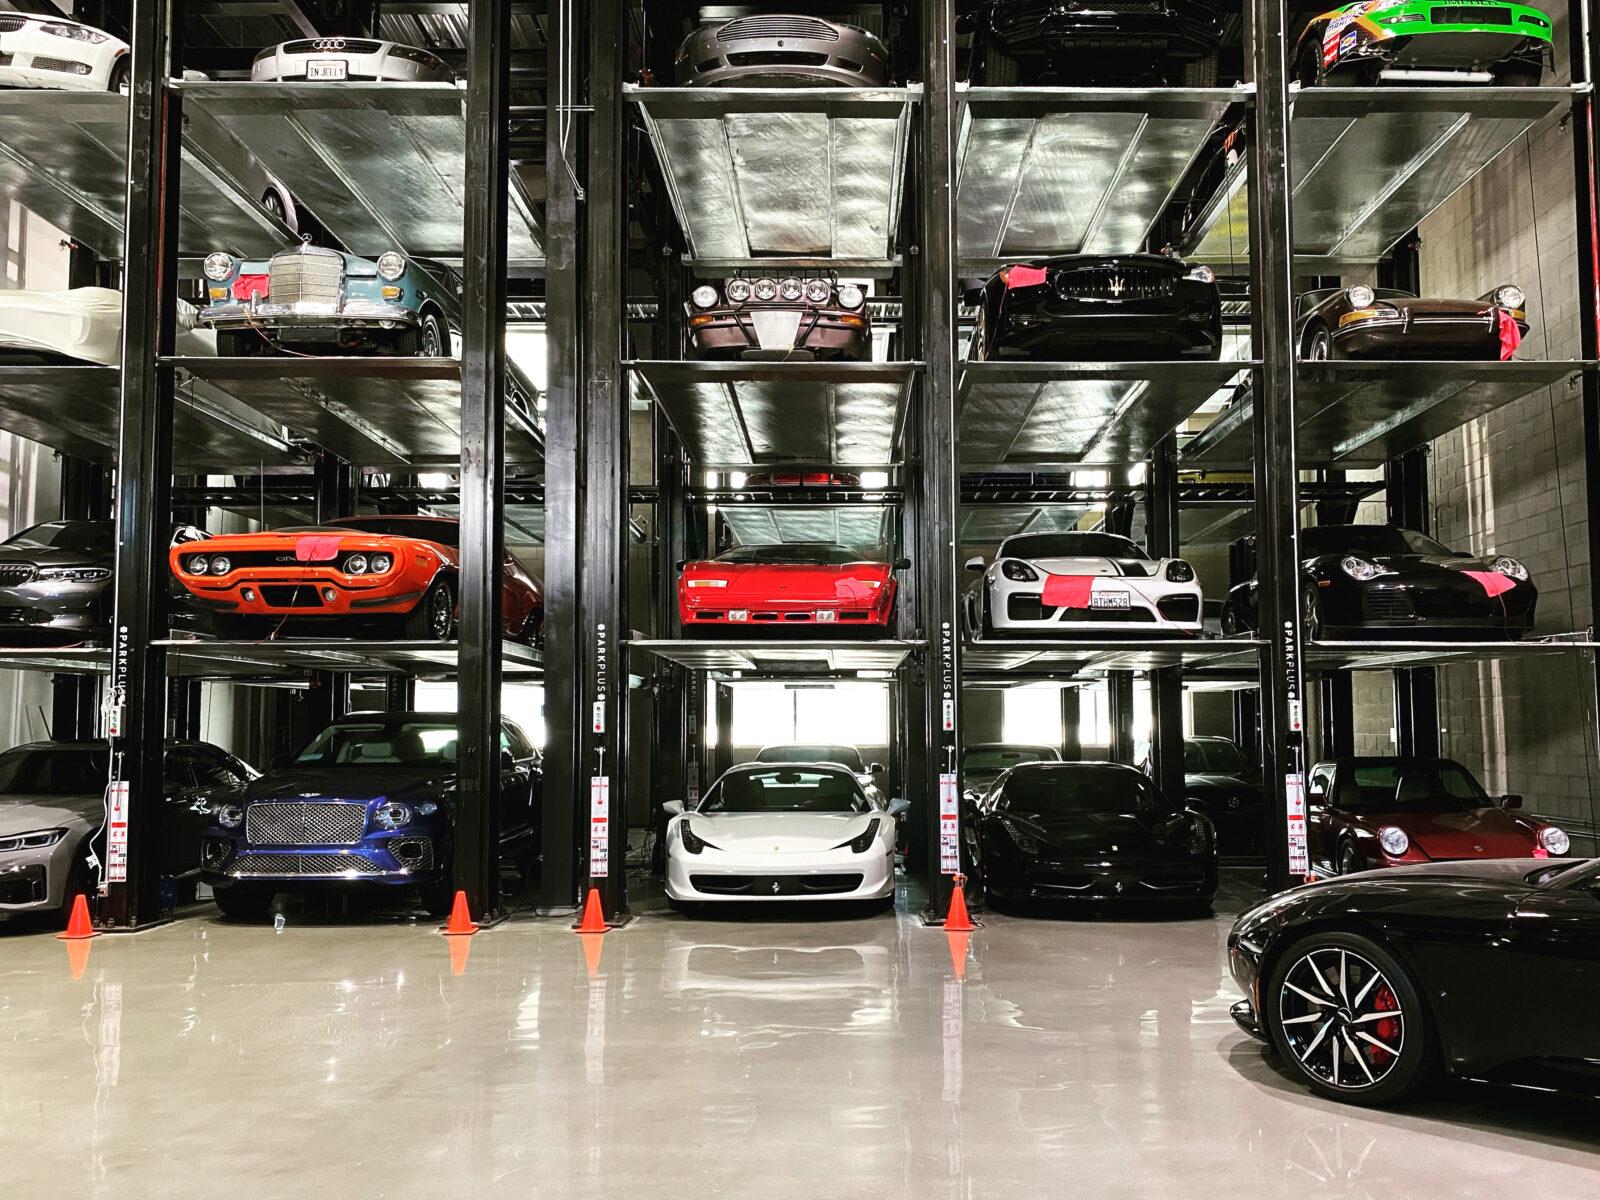 Westside Collector Car Storage